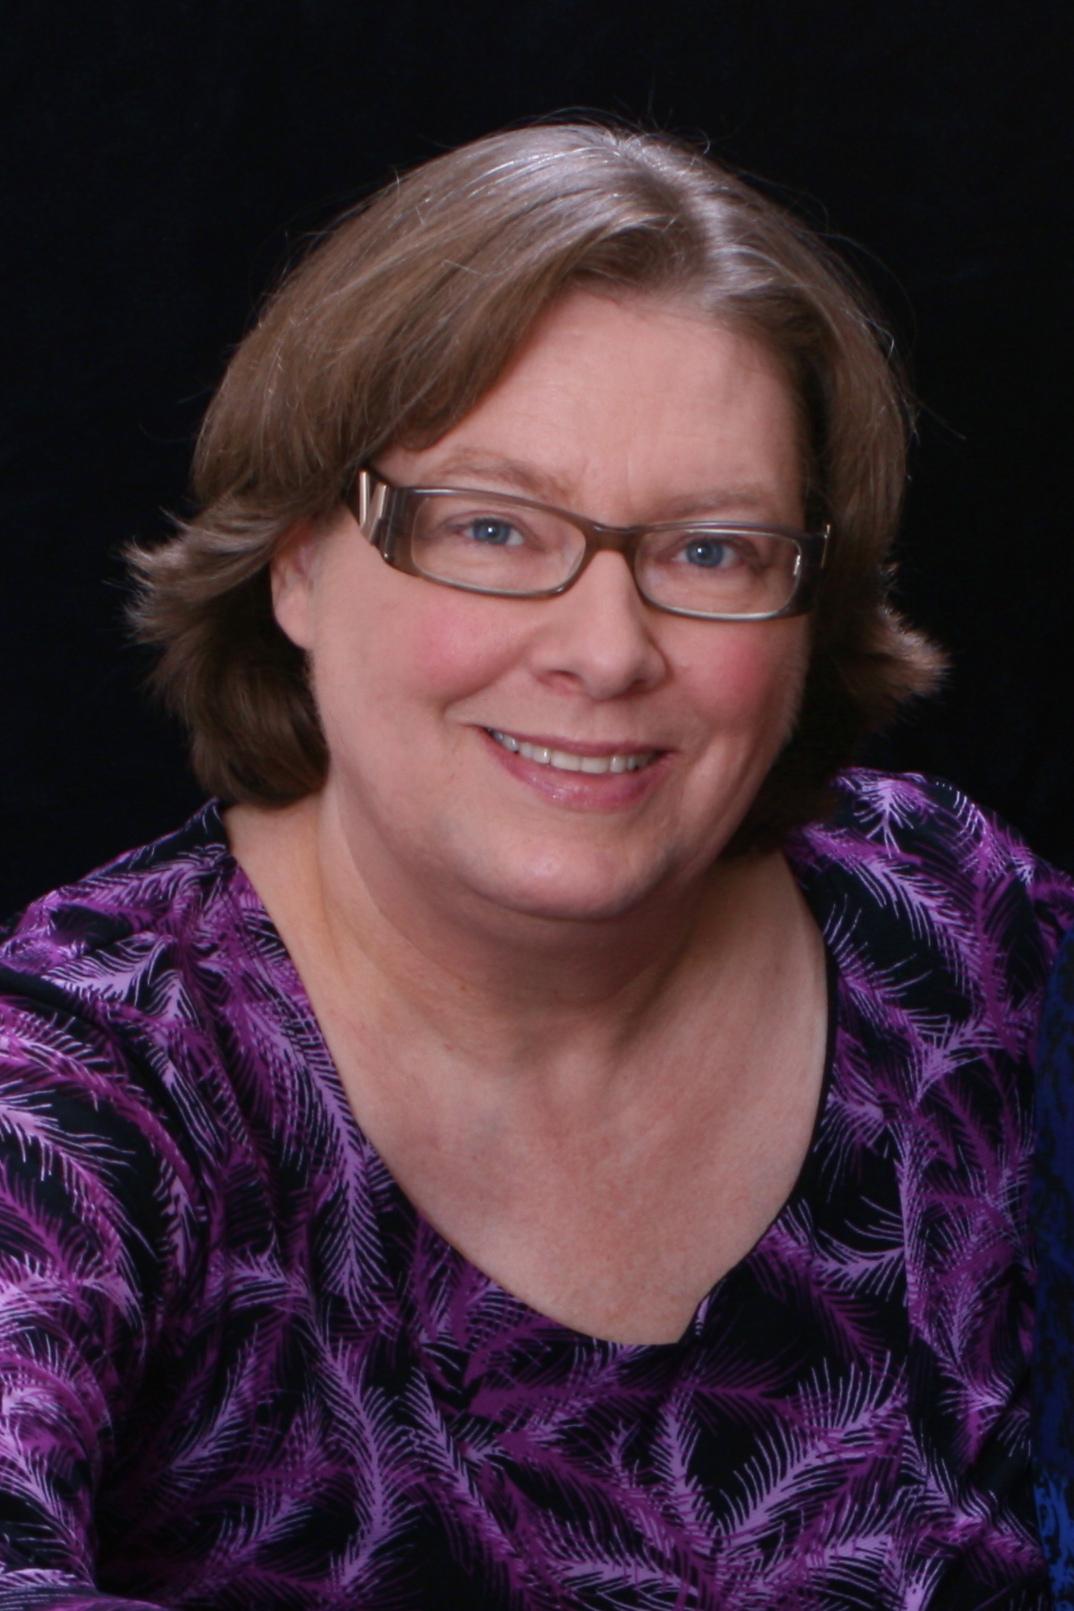 Susan-AllendorfIMG_5856.jpg